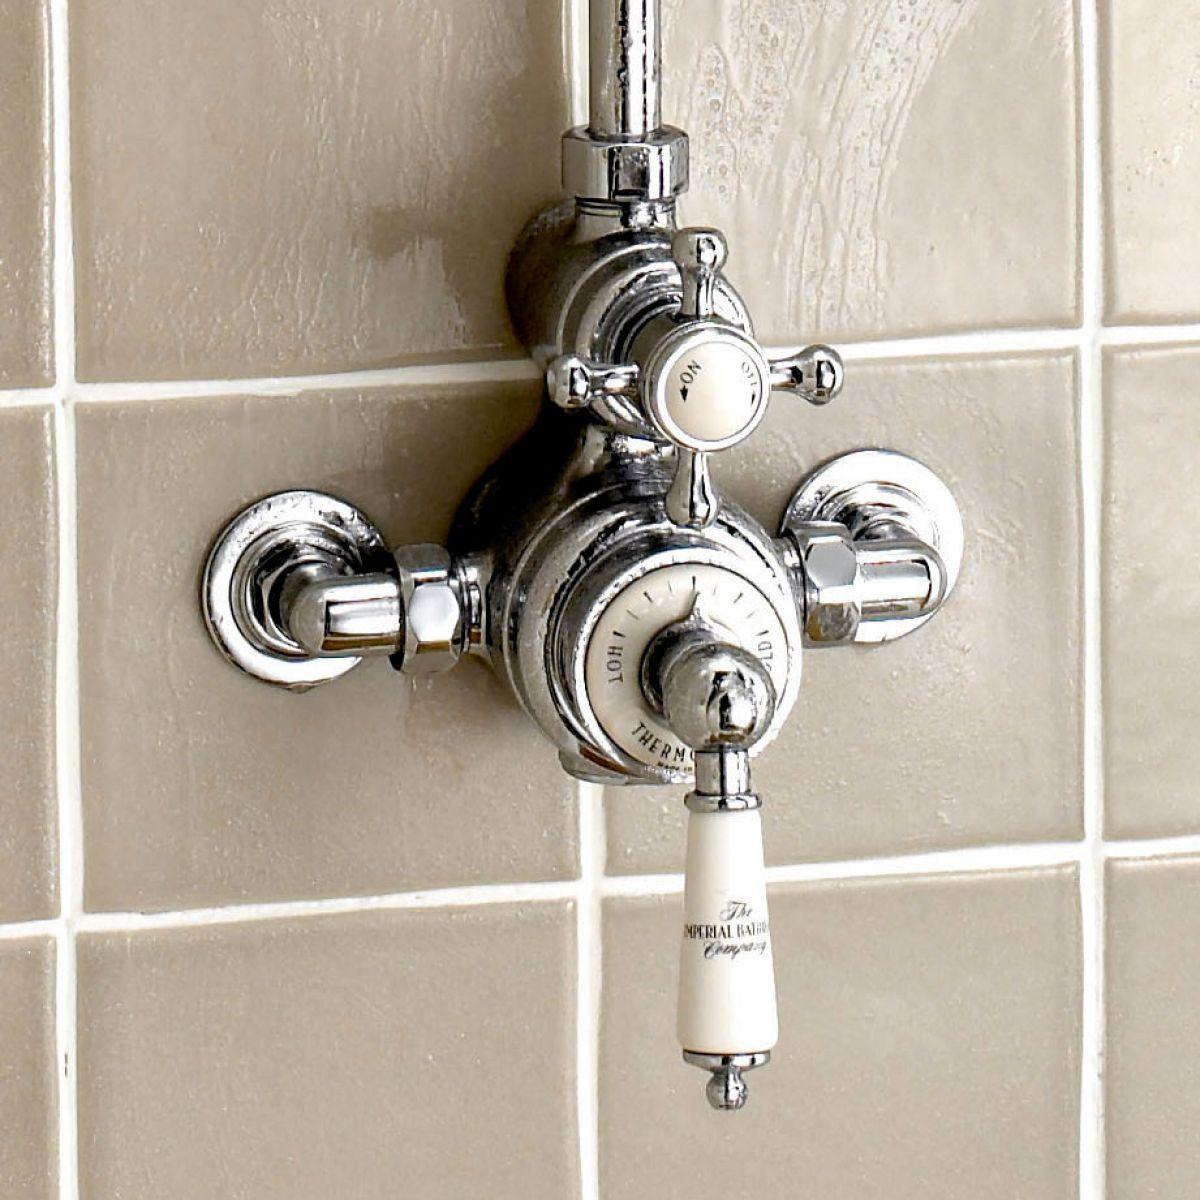 Monobloc Bath Shower Mixer Imperial Bathrooms Exposed Victorian Thermostatic Valve